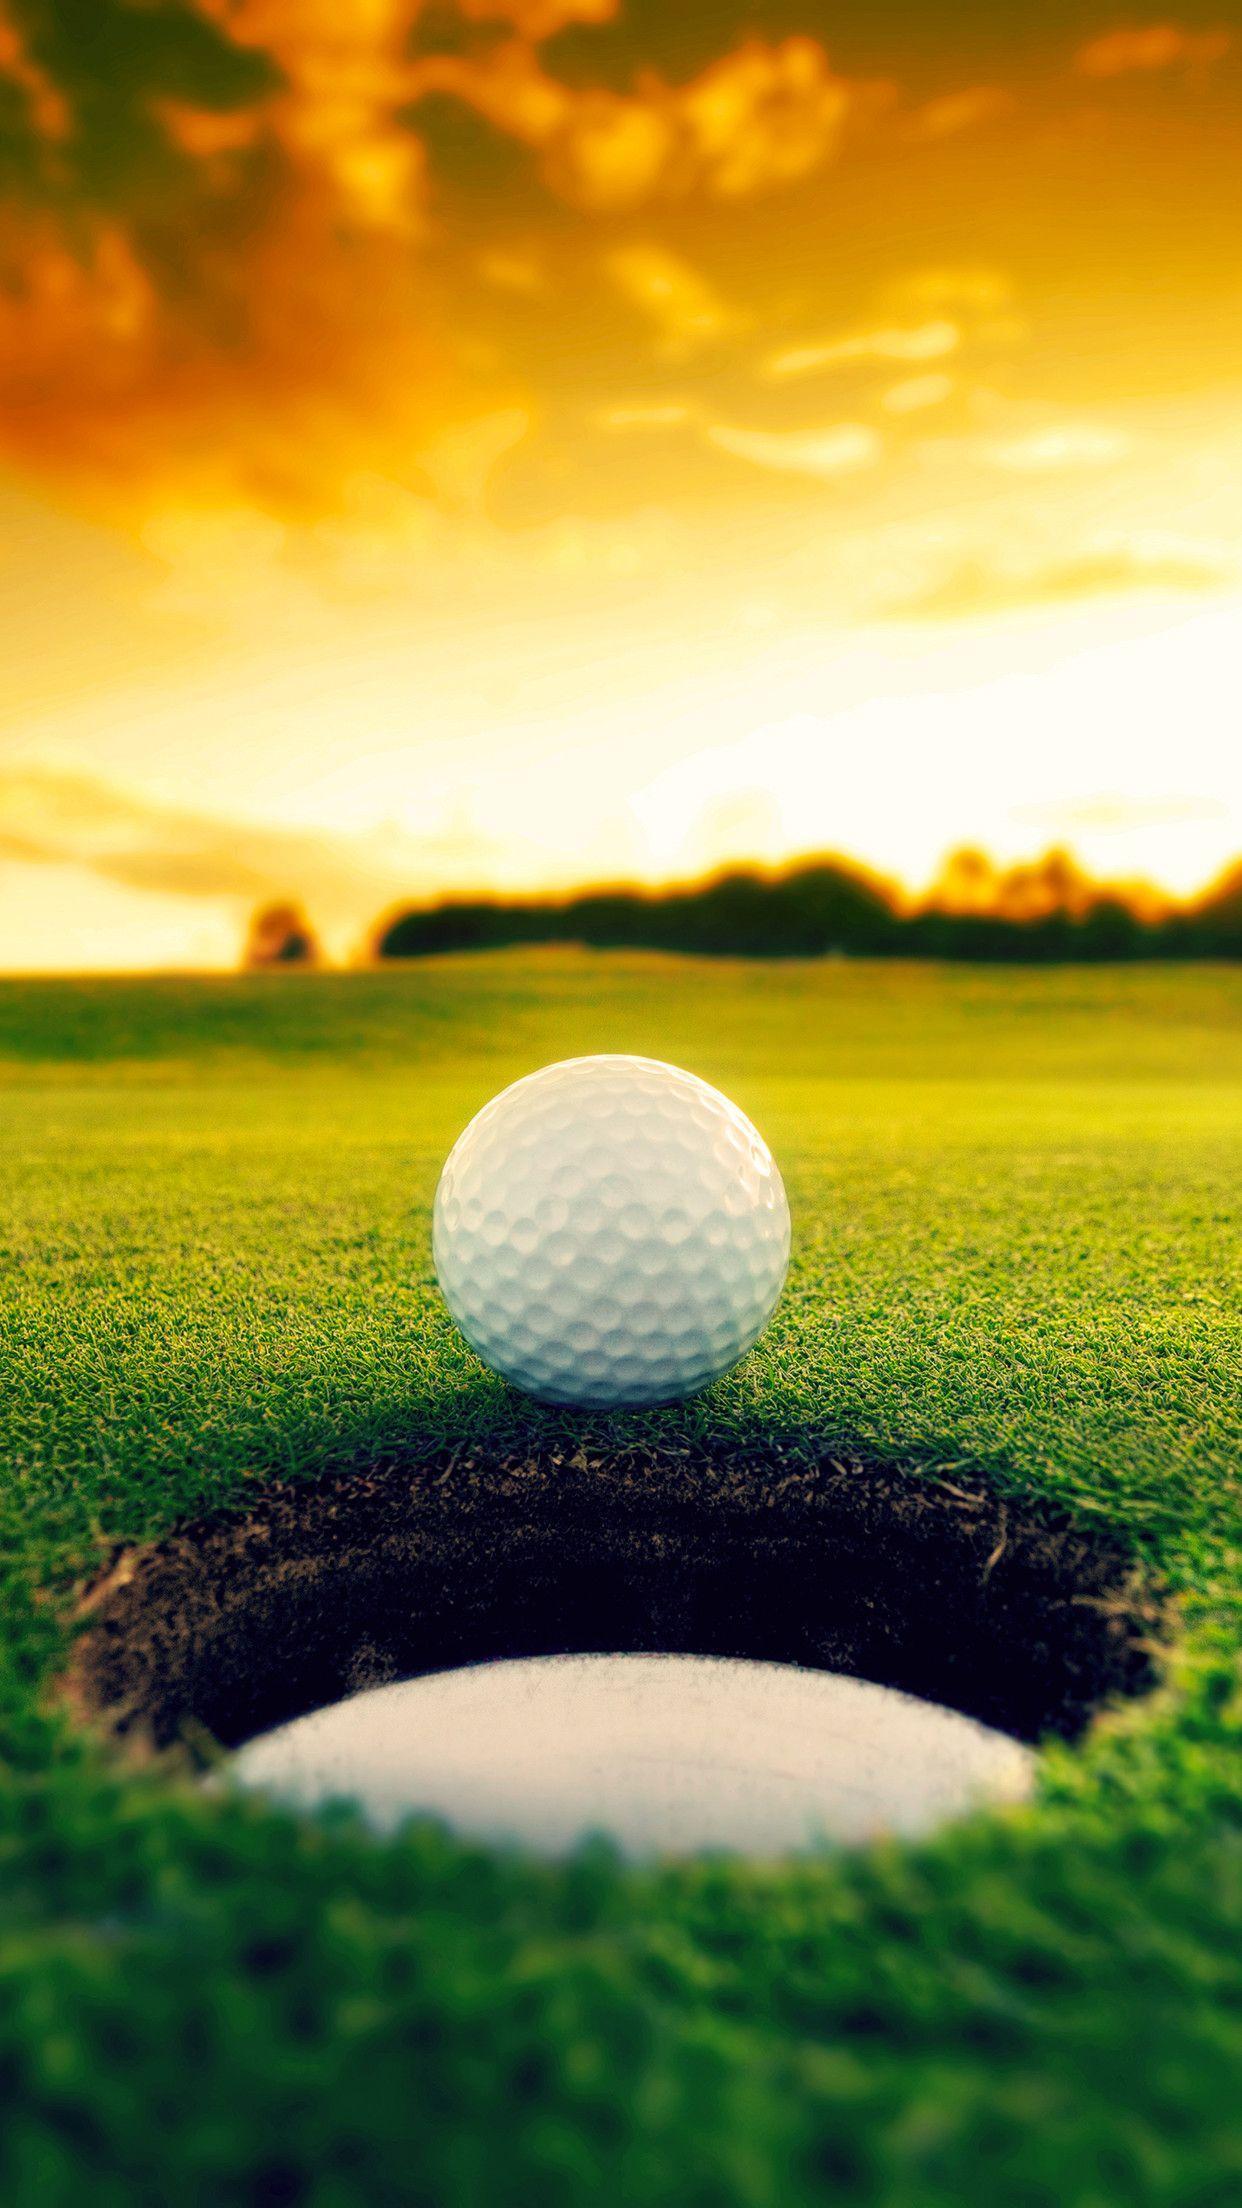 Golf Screensavers Wallpapers - Wallpaper Cave